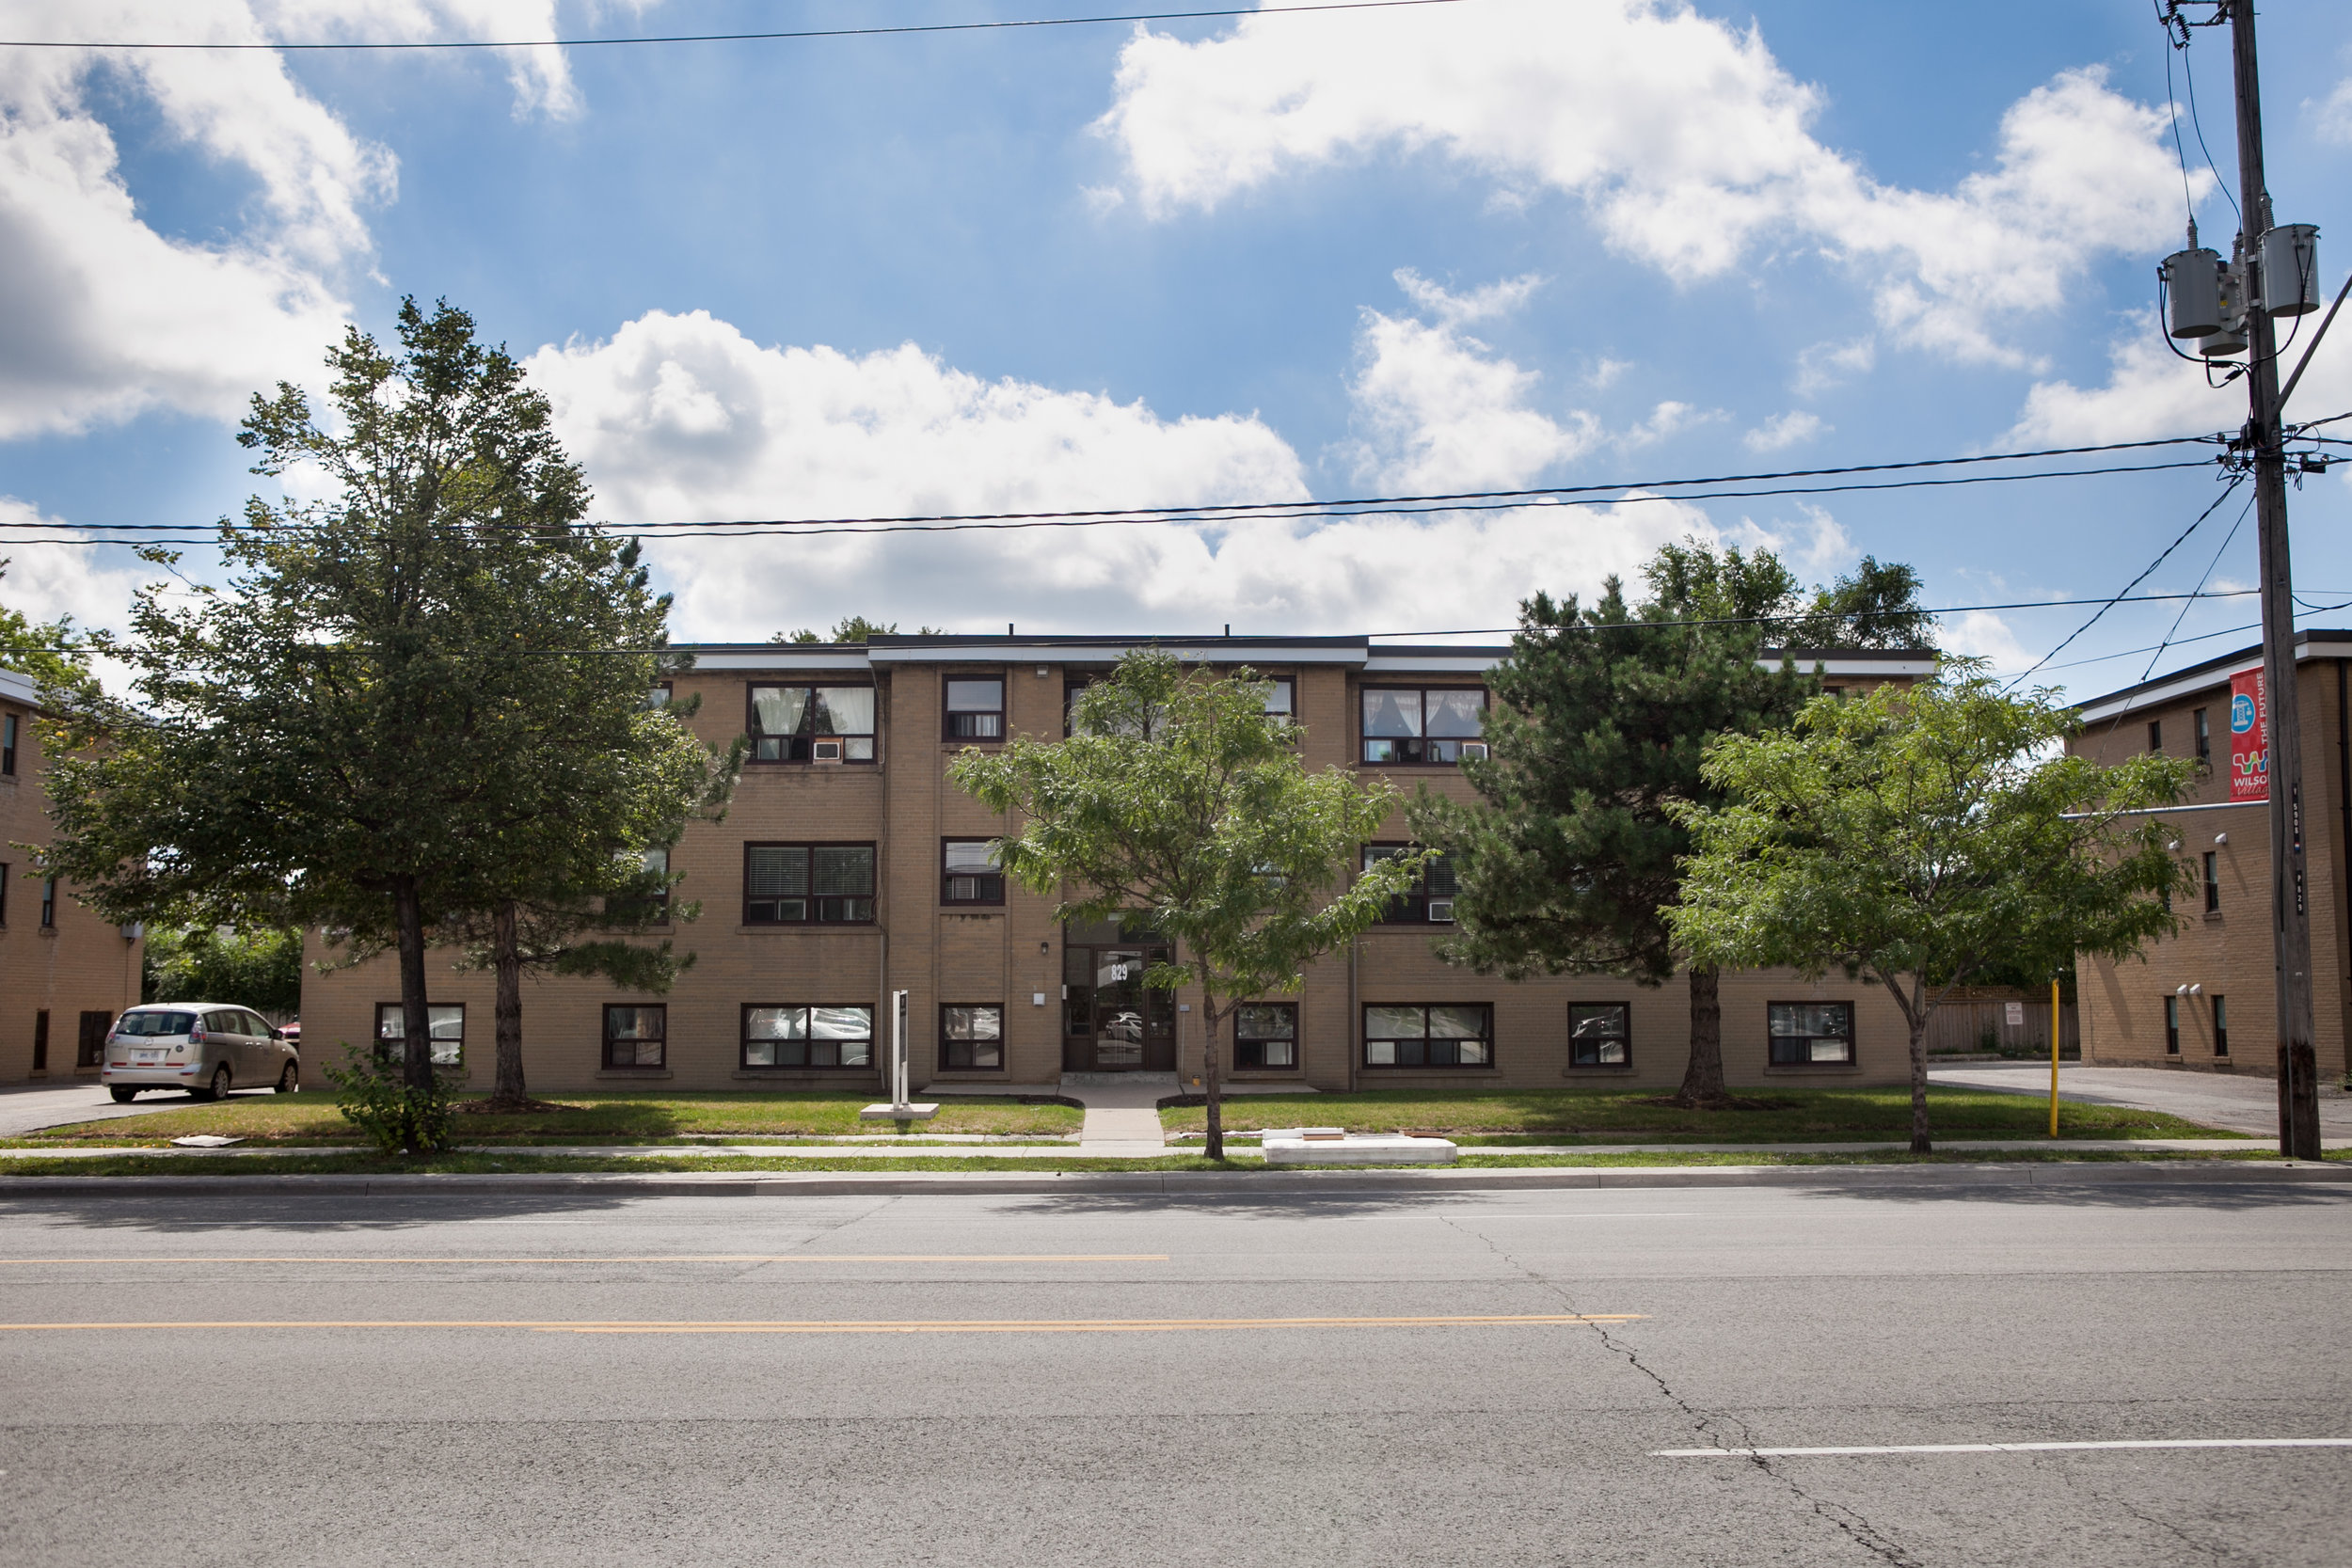 toronto-residential-property-management-823-wilson-avenue.jpg